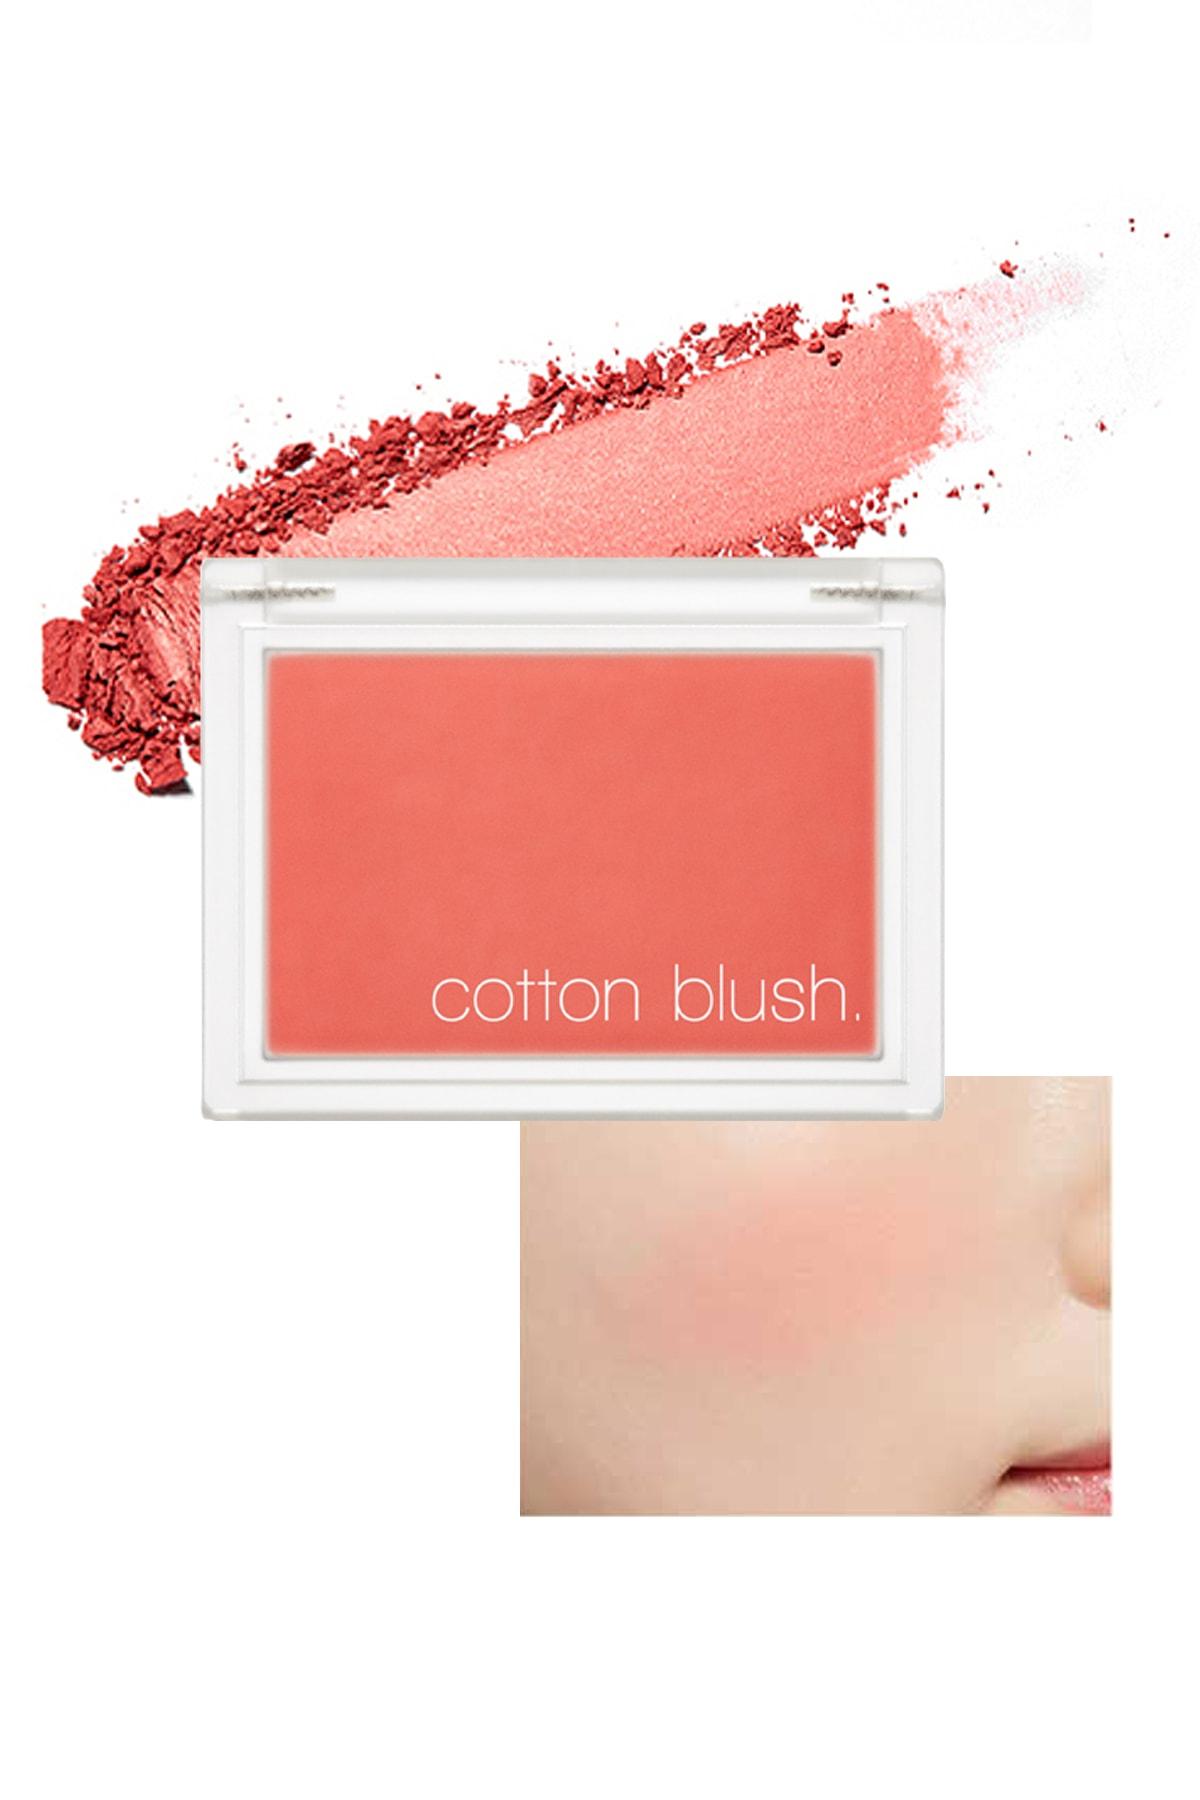 Missha Yumuşak Dokulu Kolay Sürülebilen Allık Cotton Blusher (Sunny Afternoon) 0